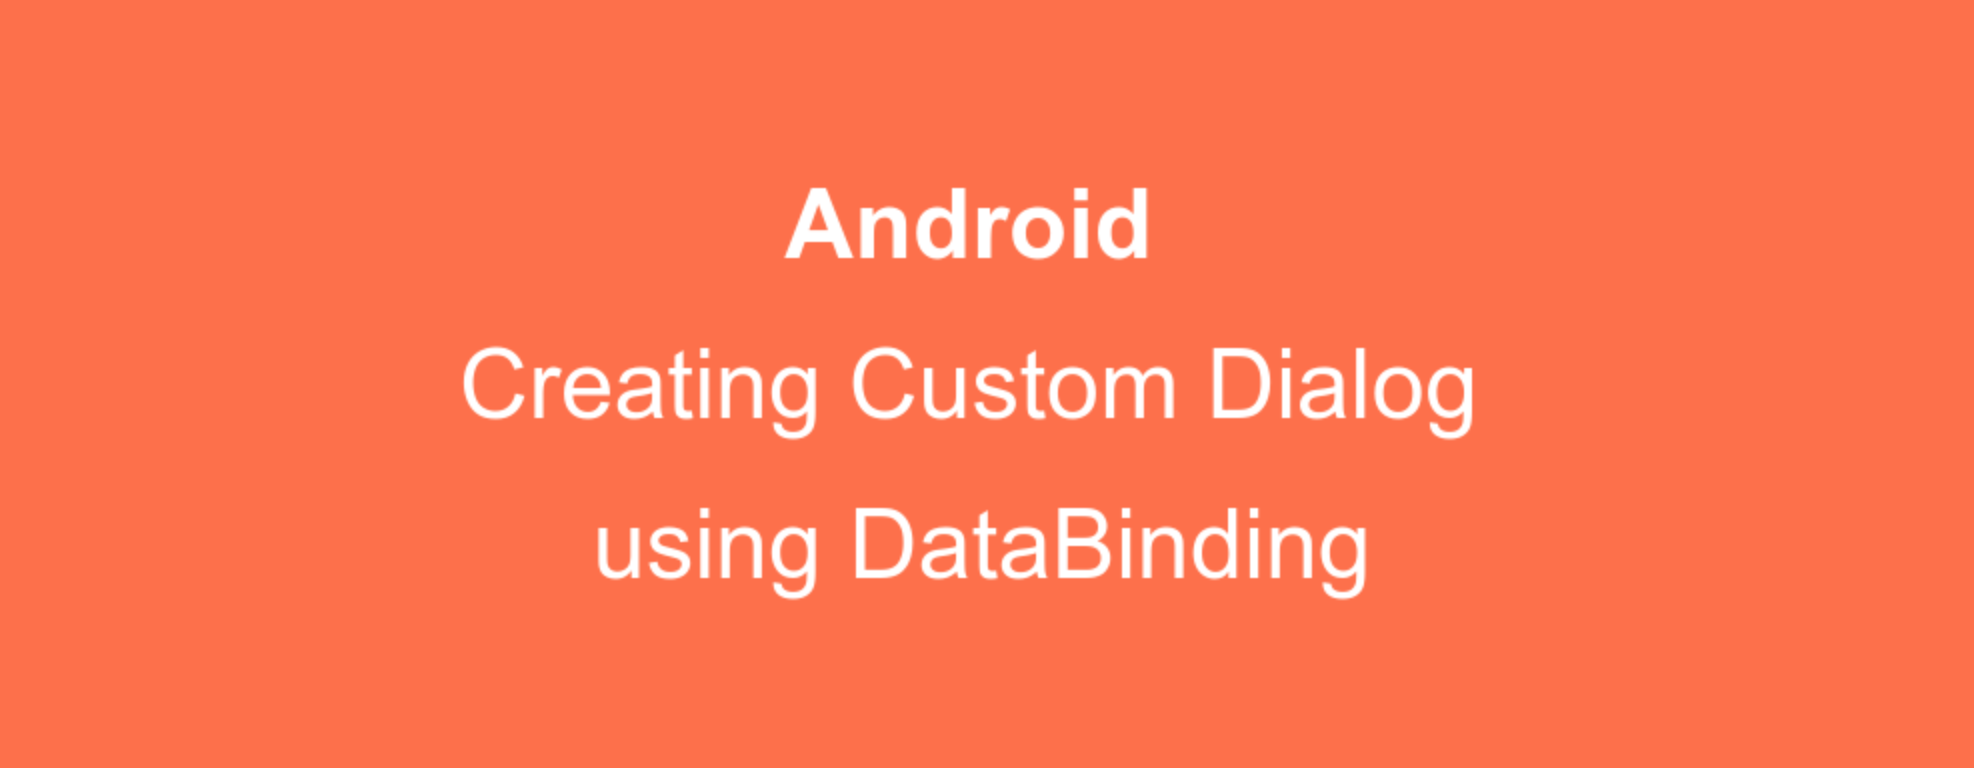 Android 10 源码分析:Dialog加载绘制流程以及在Kotlin、DataBinding中的使用